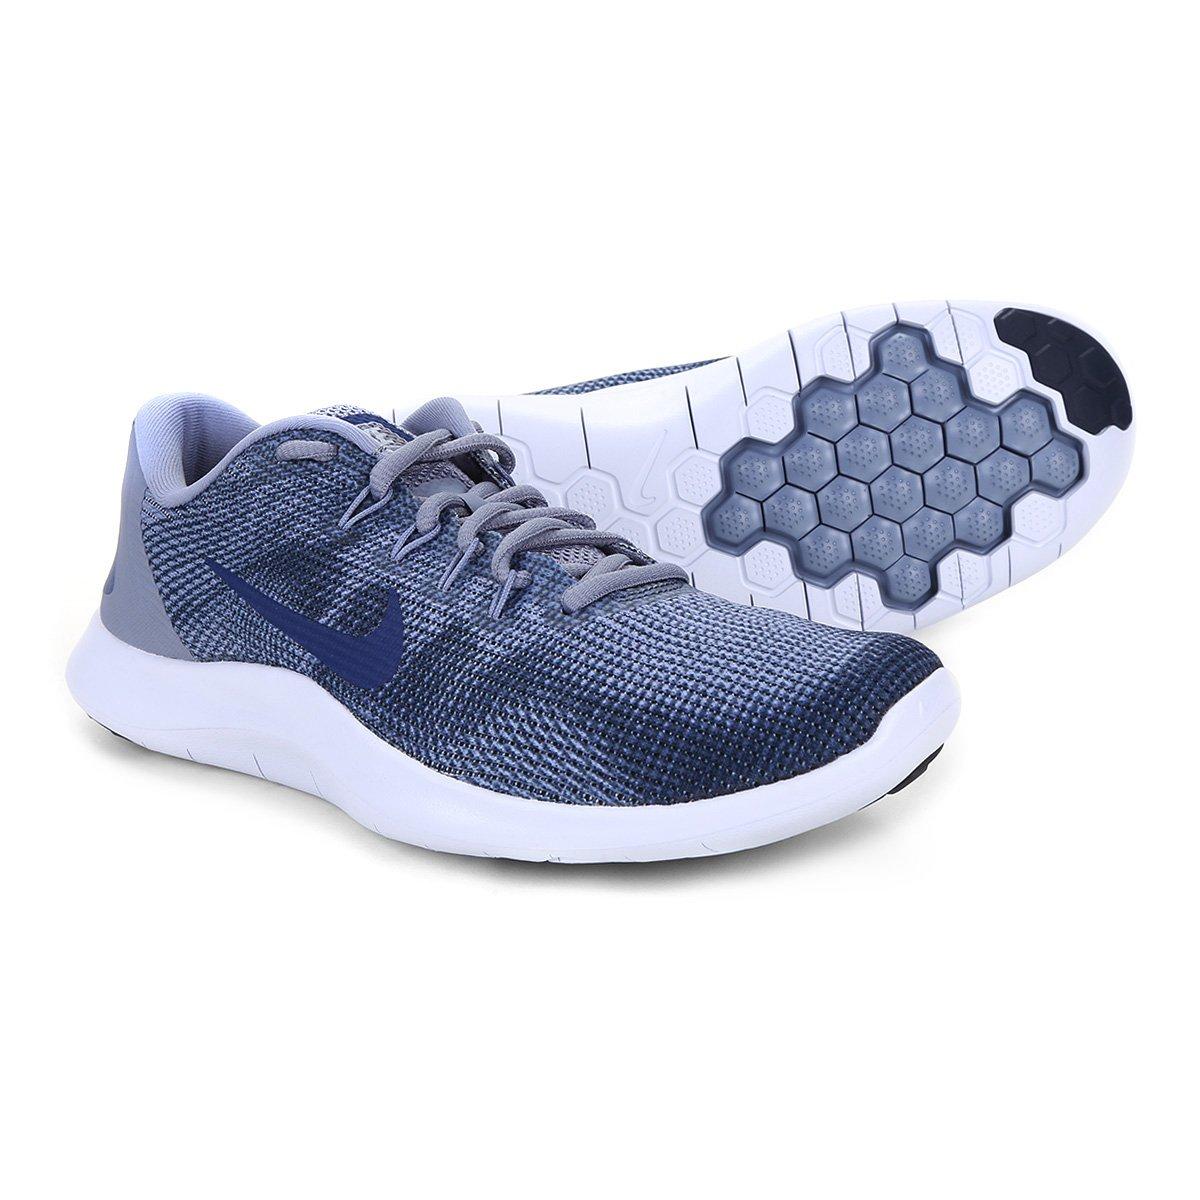 6348122c696 Tênis Nike Flex 2018 Rn Masculino - Azul e Cinza - Compre Agora ...